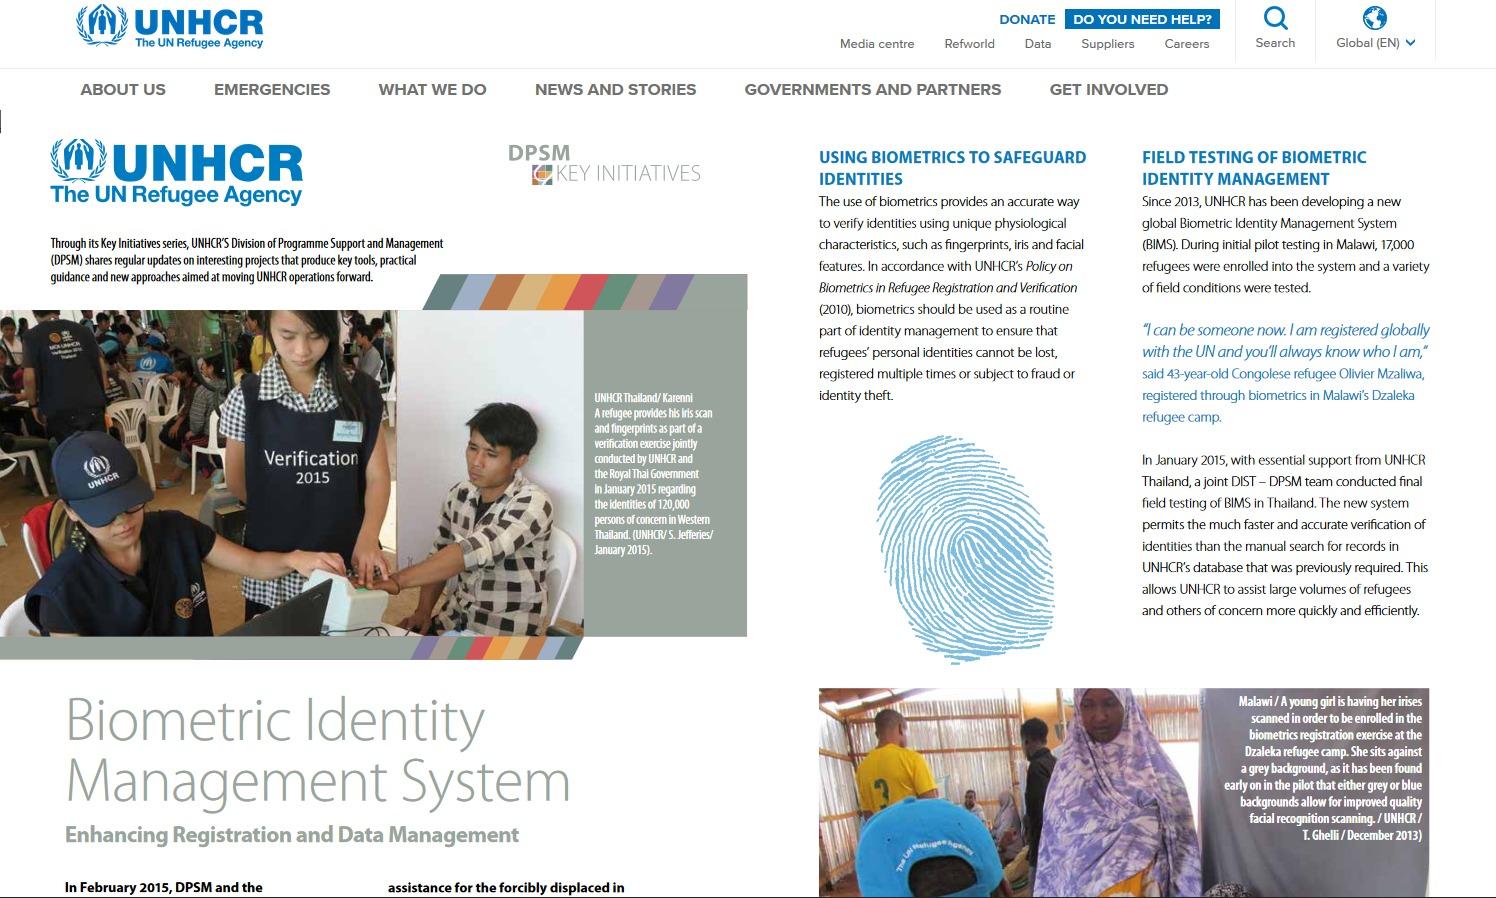 UNHCR- Biometric Identity Management System